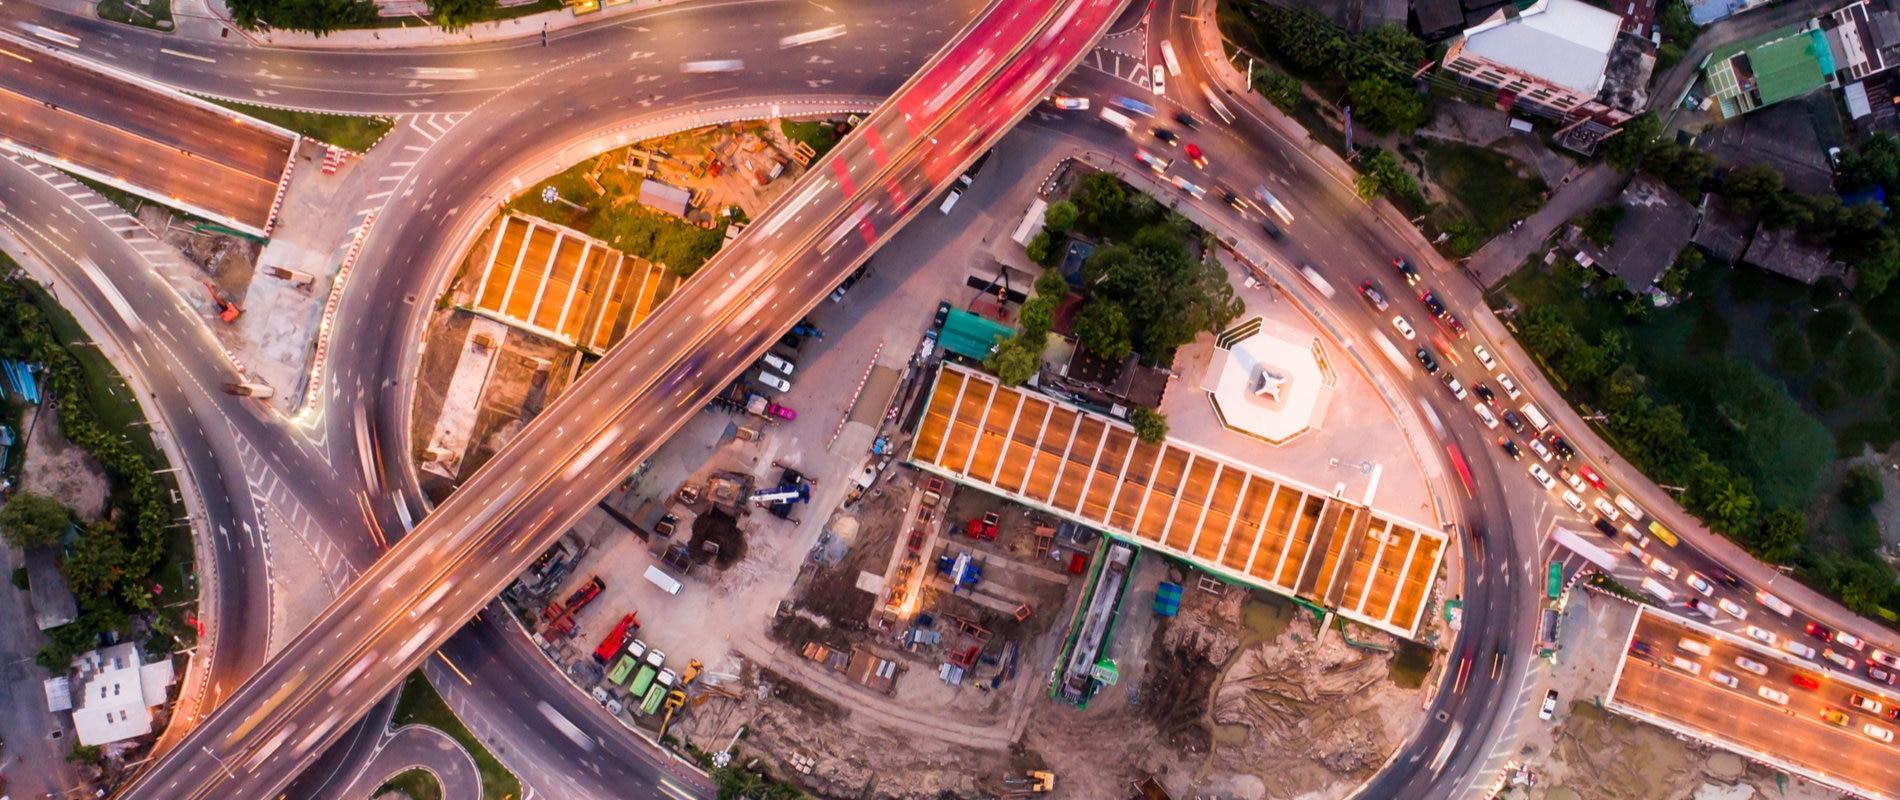 road-car-traffic-resource-bbva